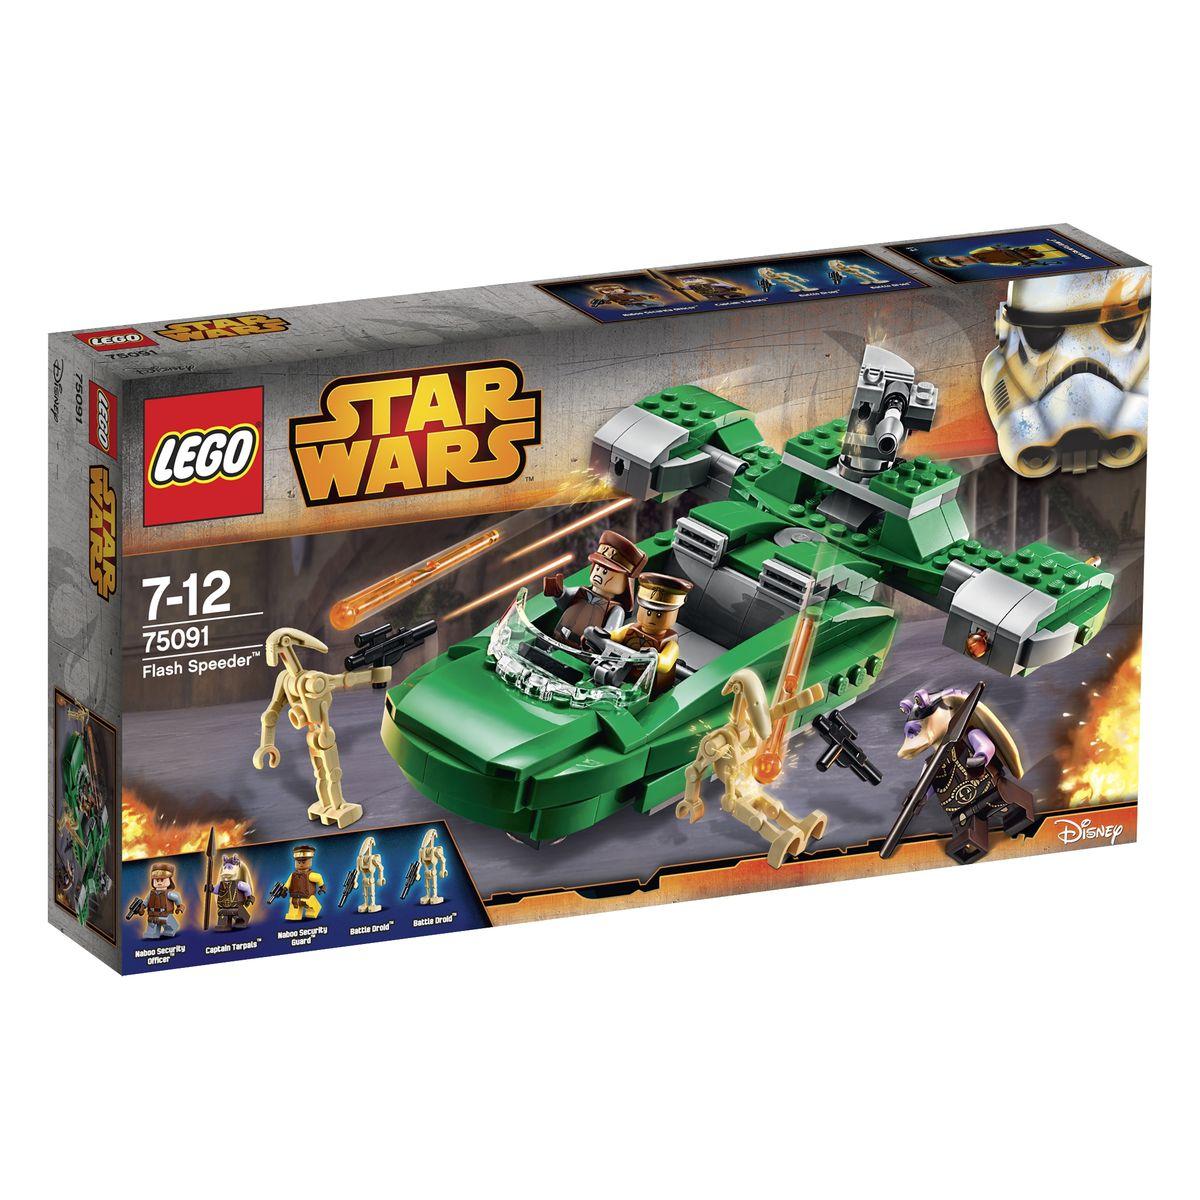 LEGO Star Wars Конструктор Флэш спидер 75091